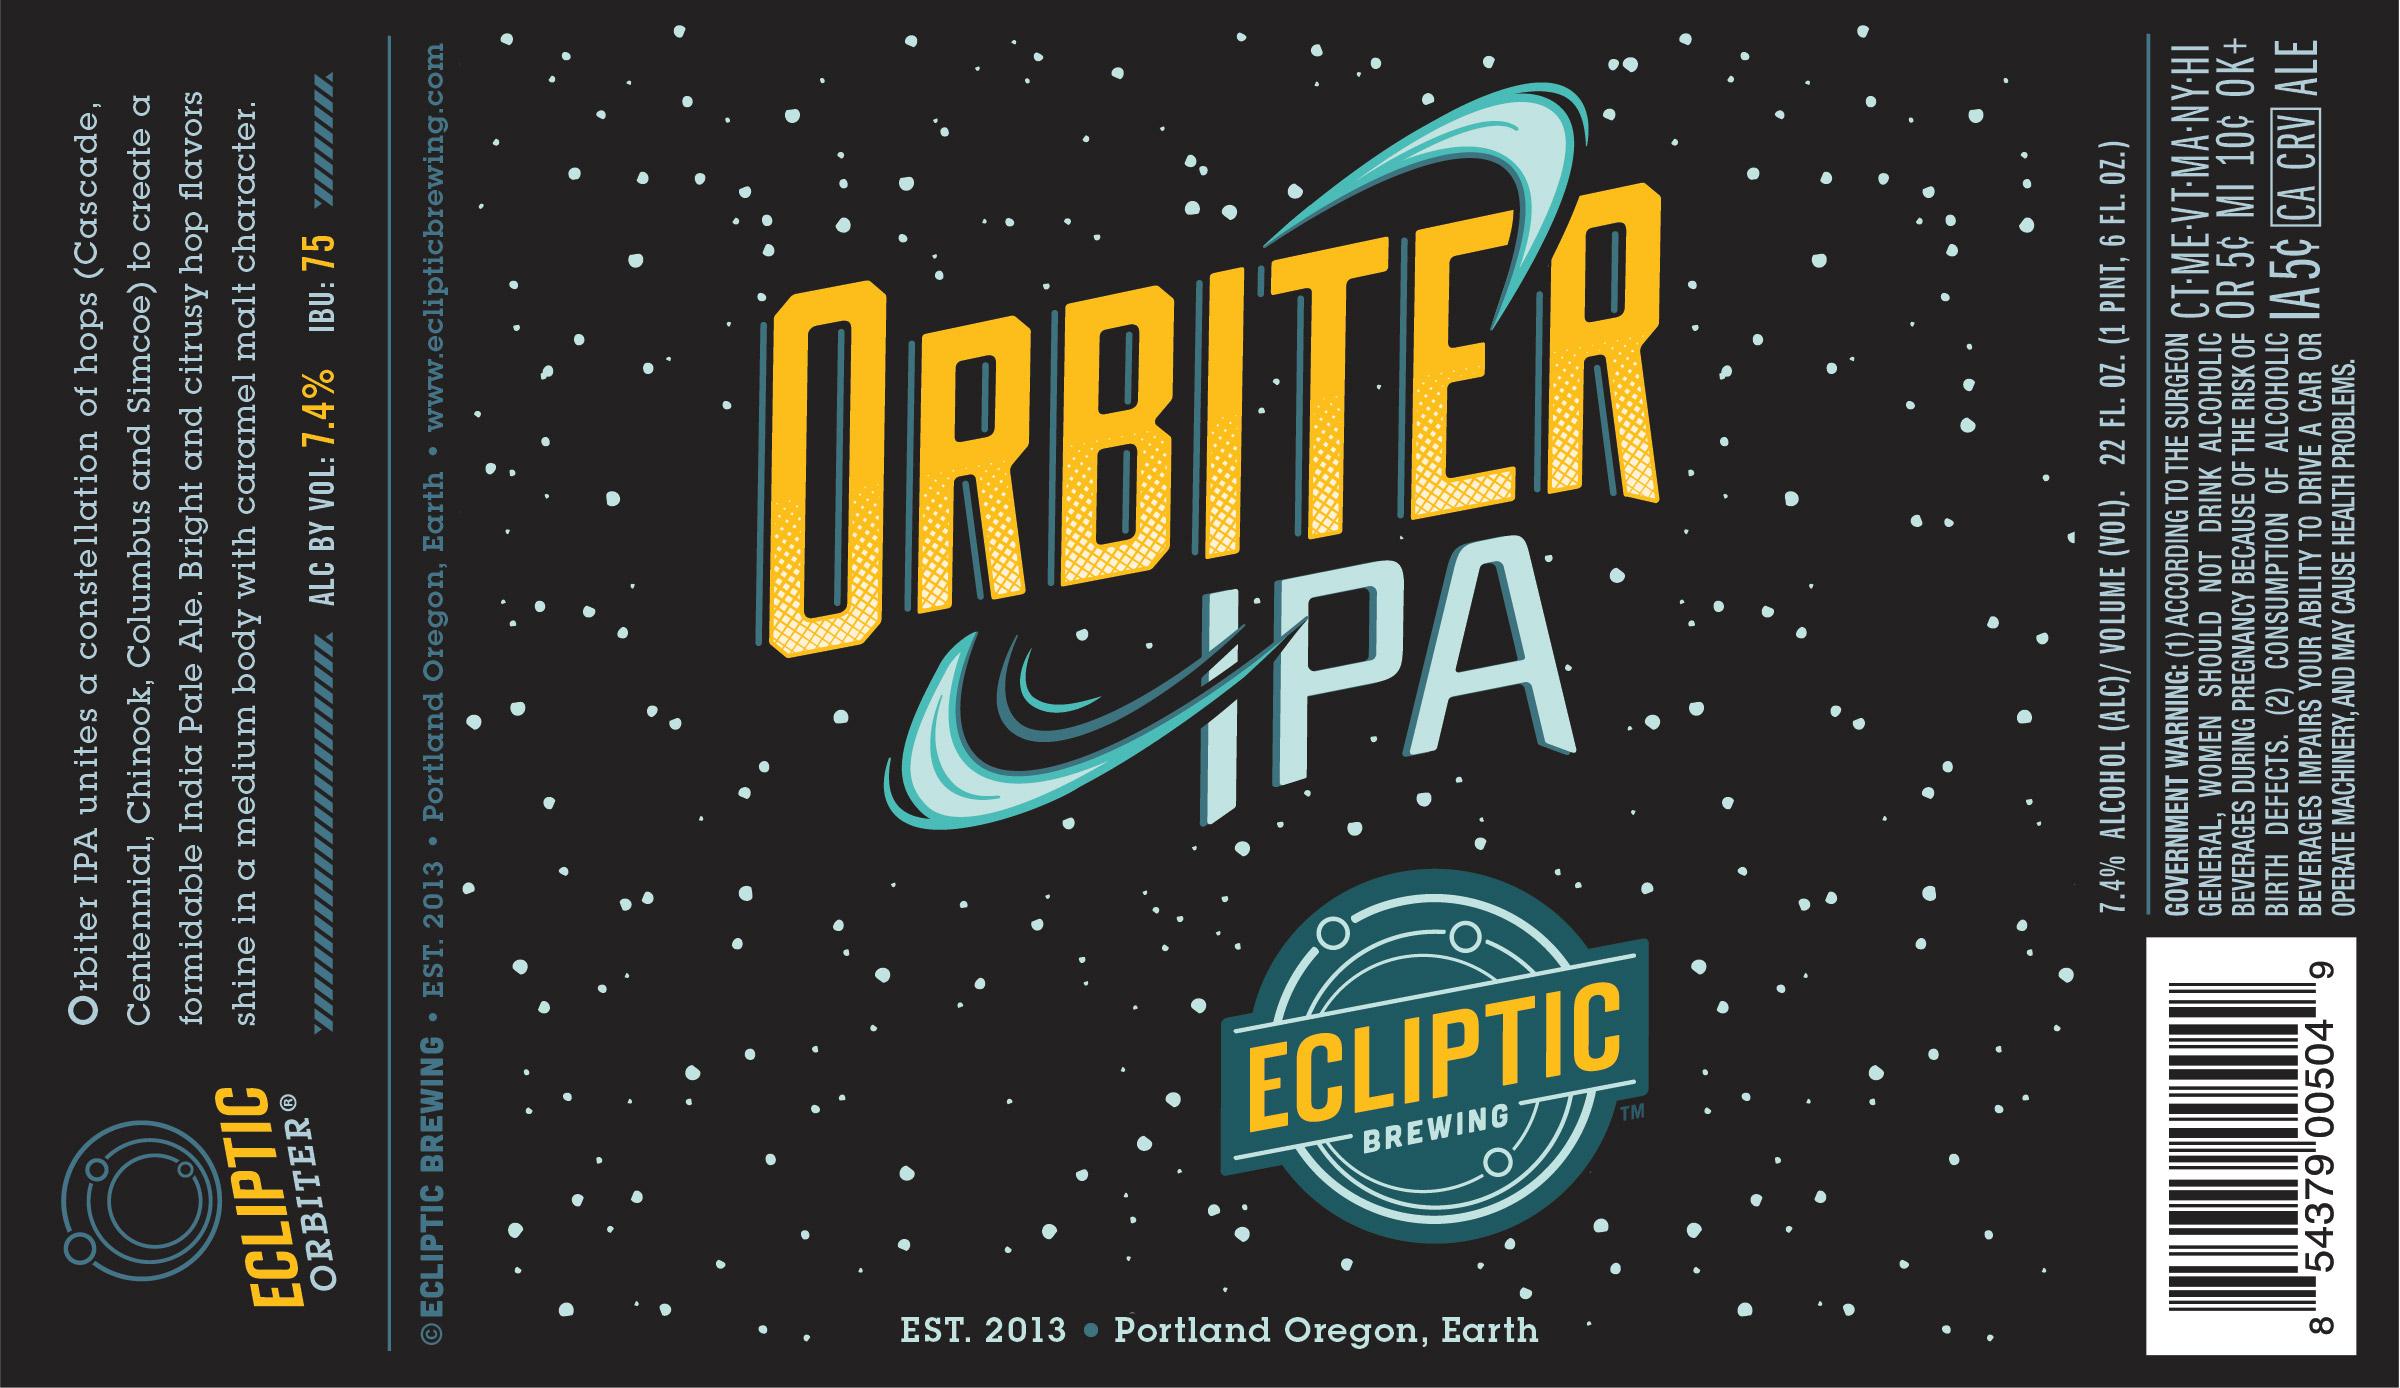 Ecliptic Orbiter IPA